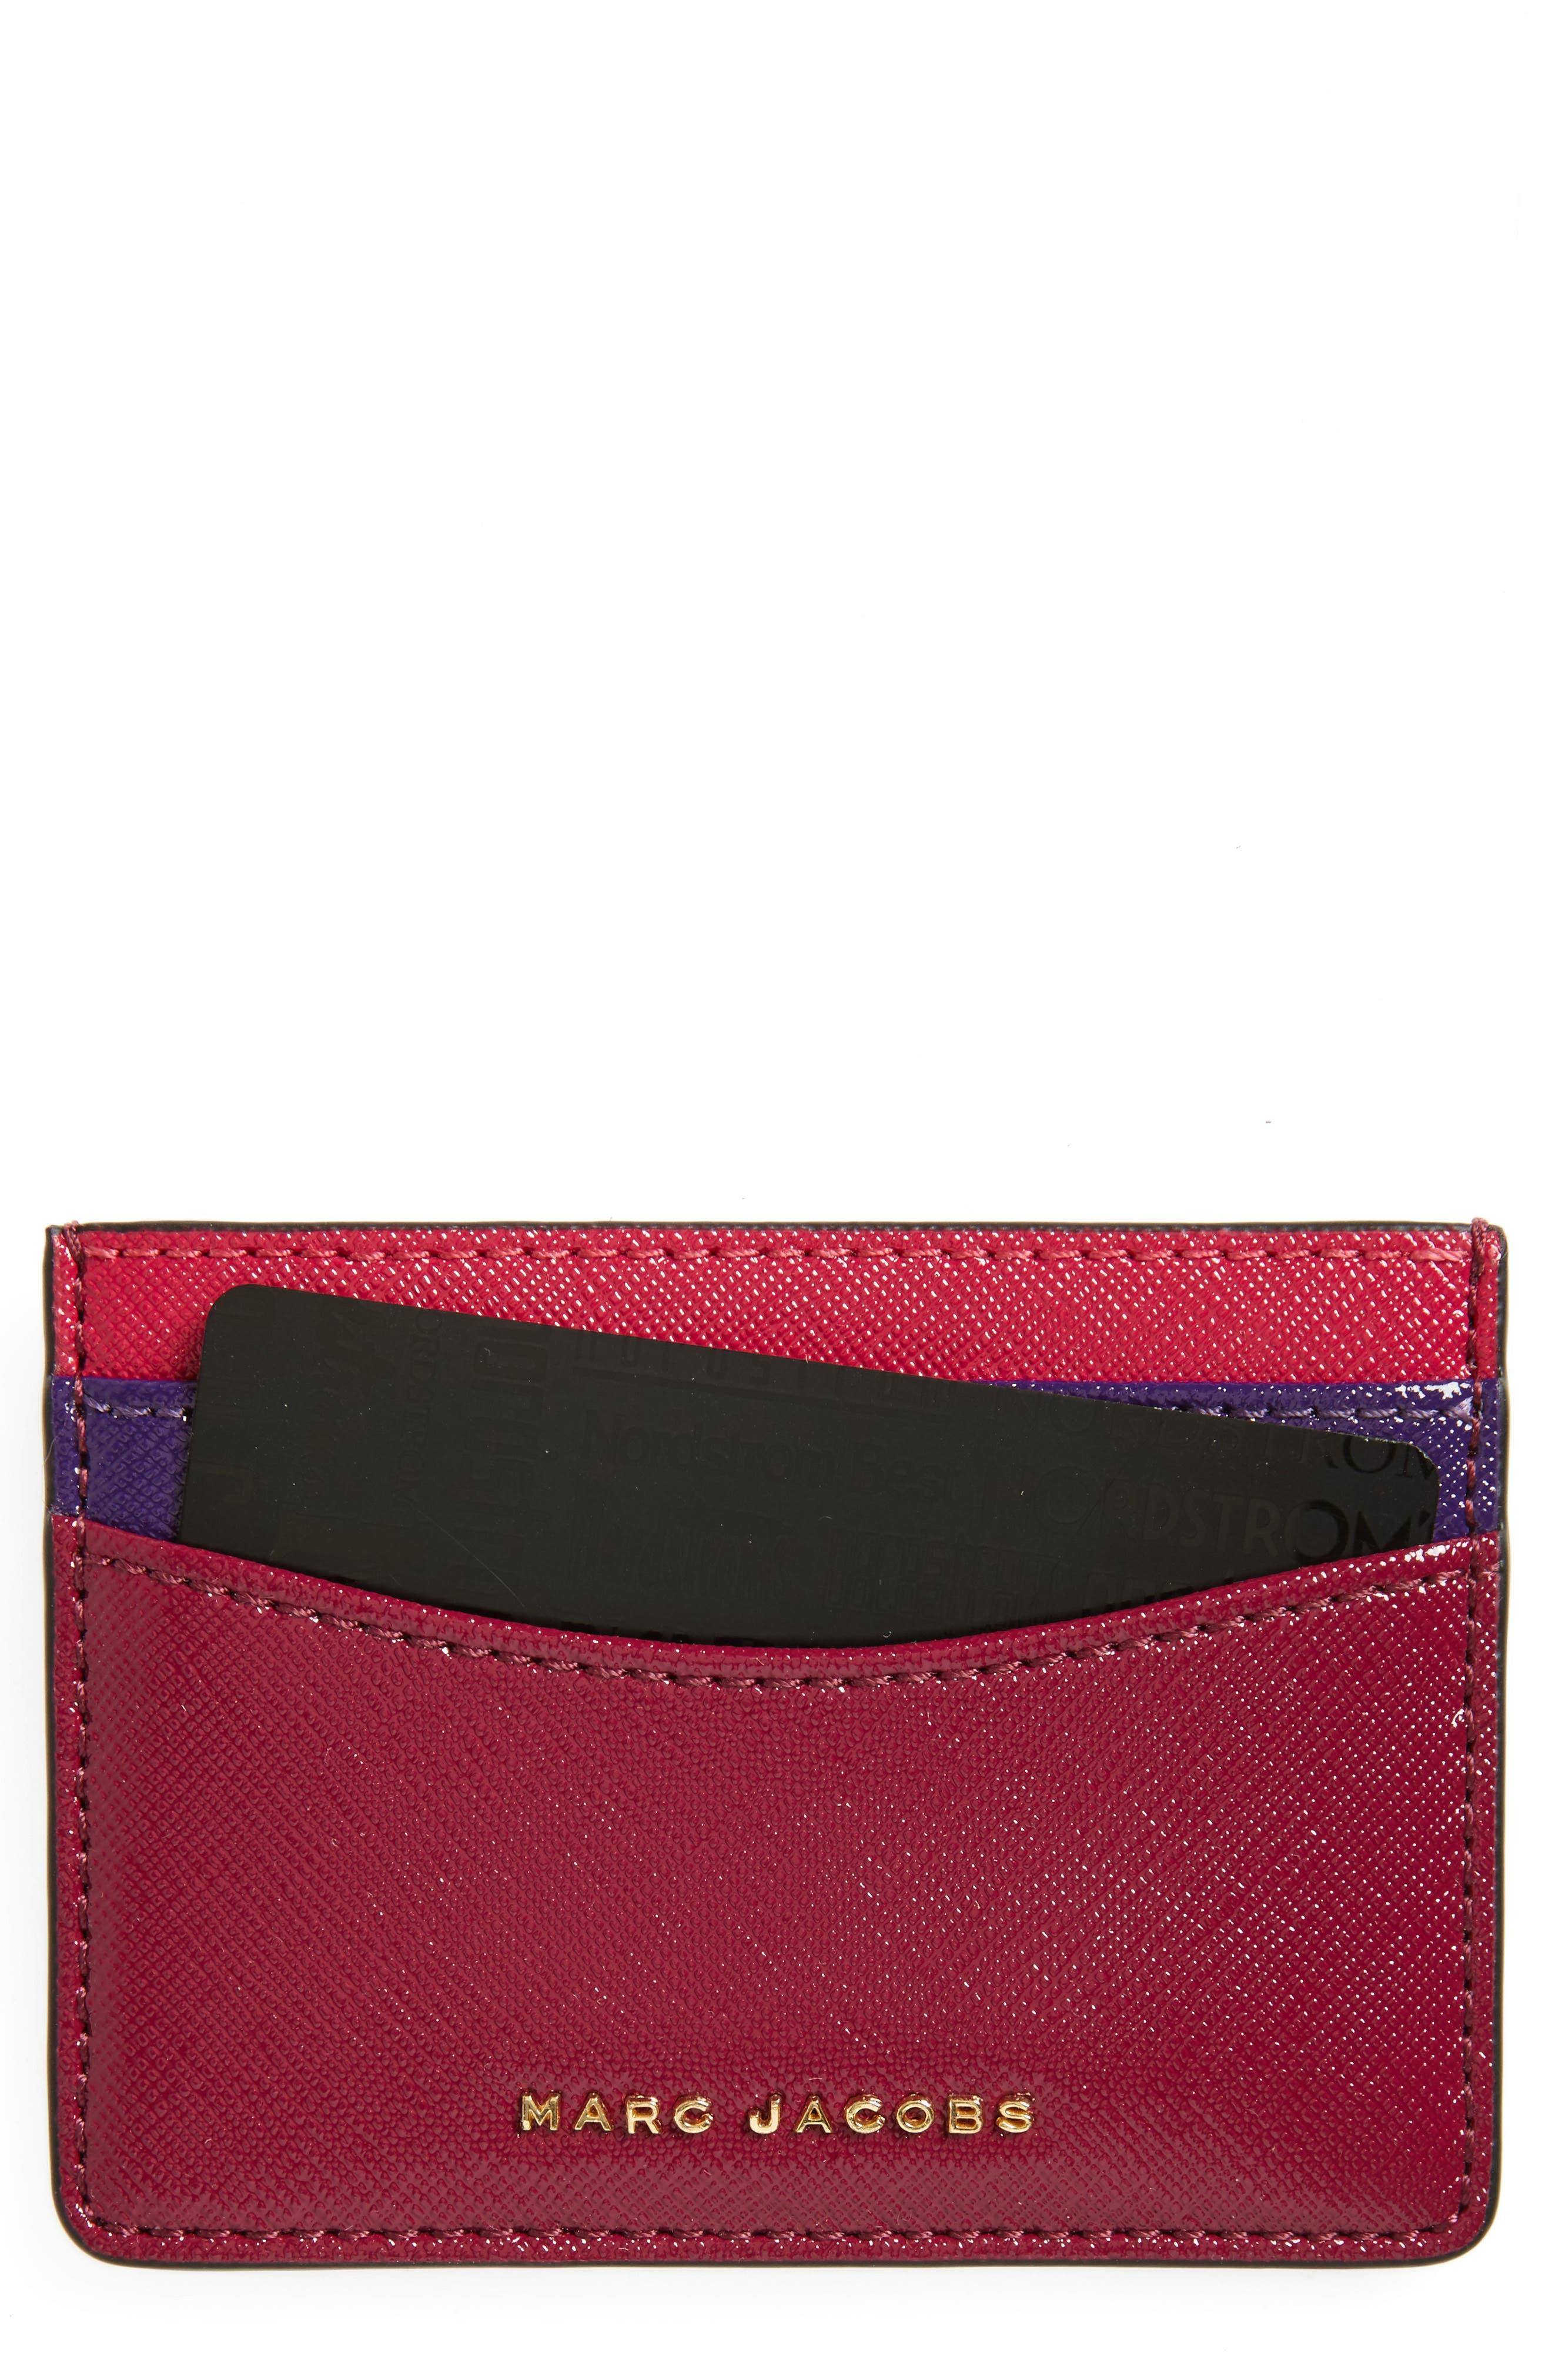 MARC JACOBS Color Block Saffiano Leather Card Case